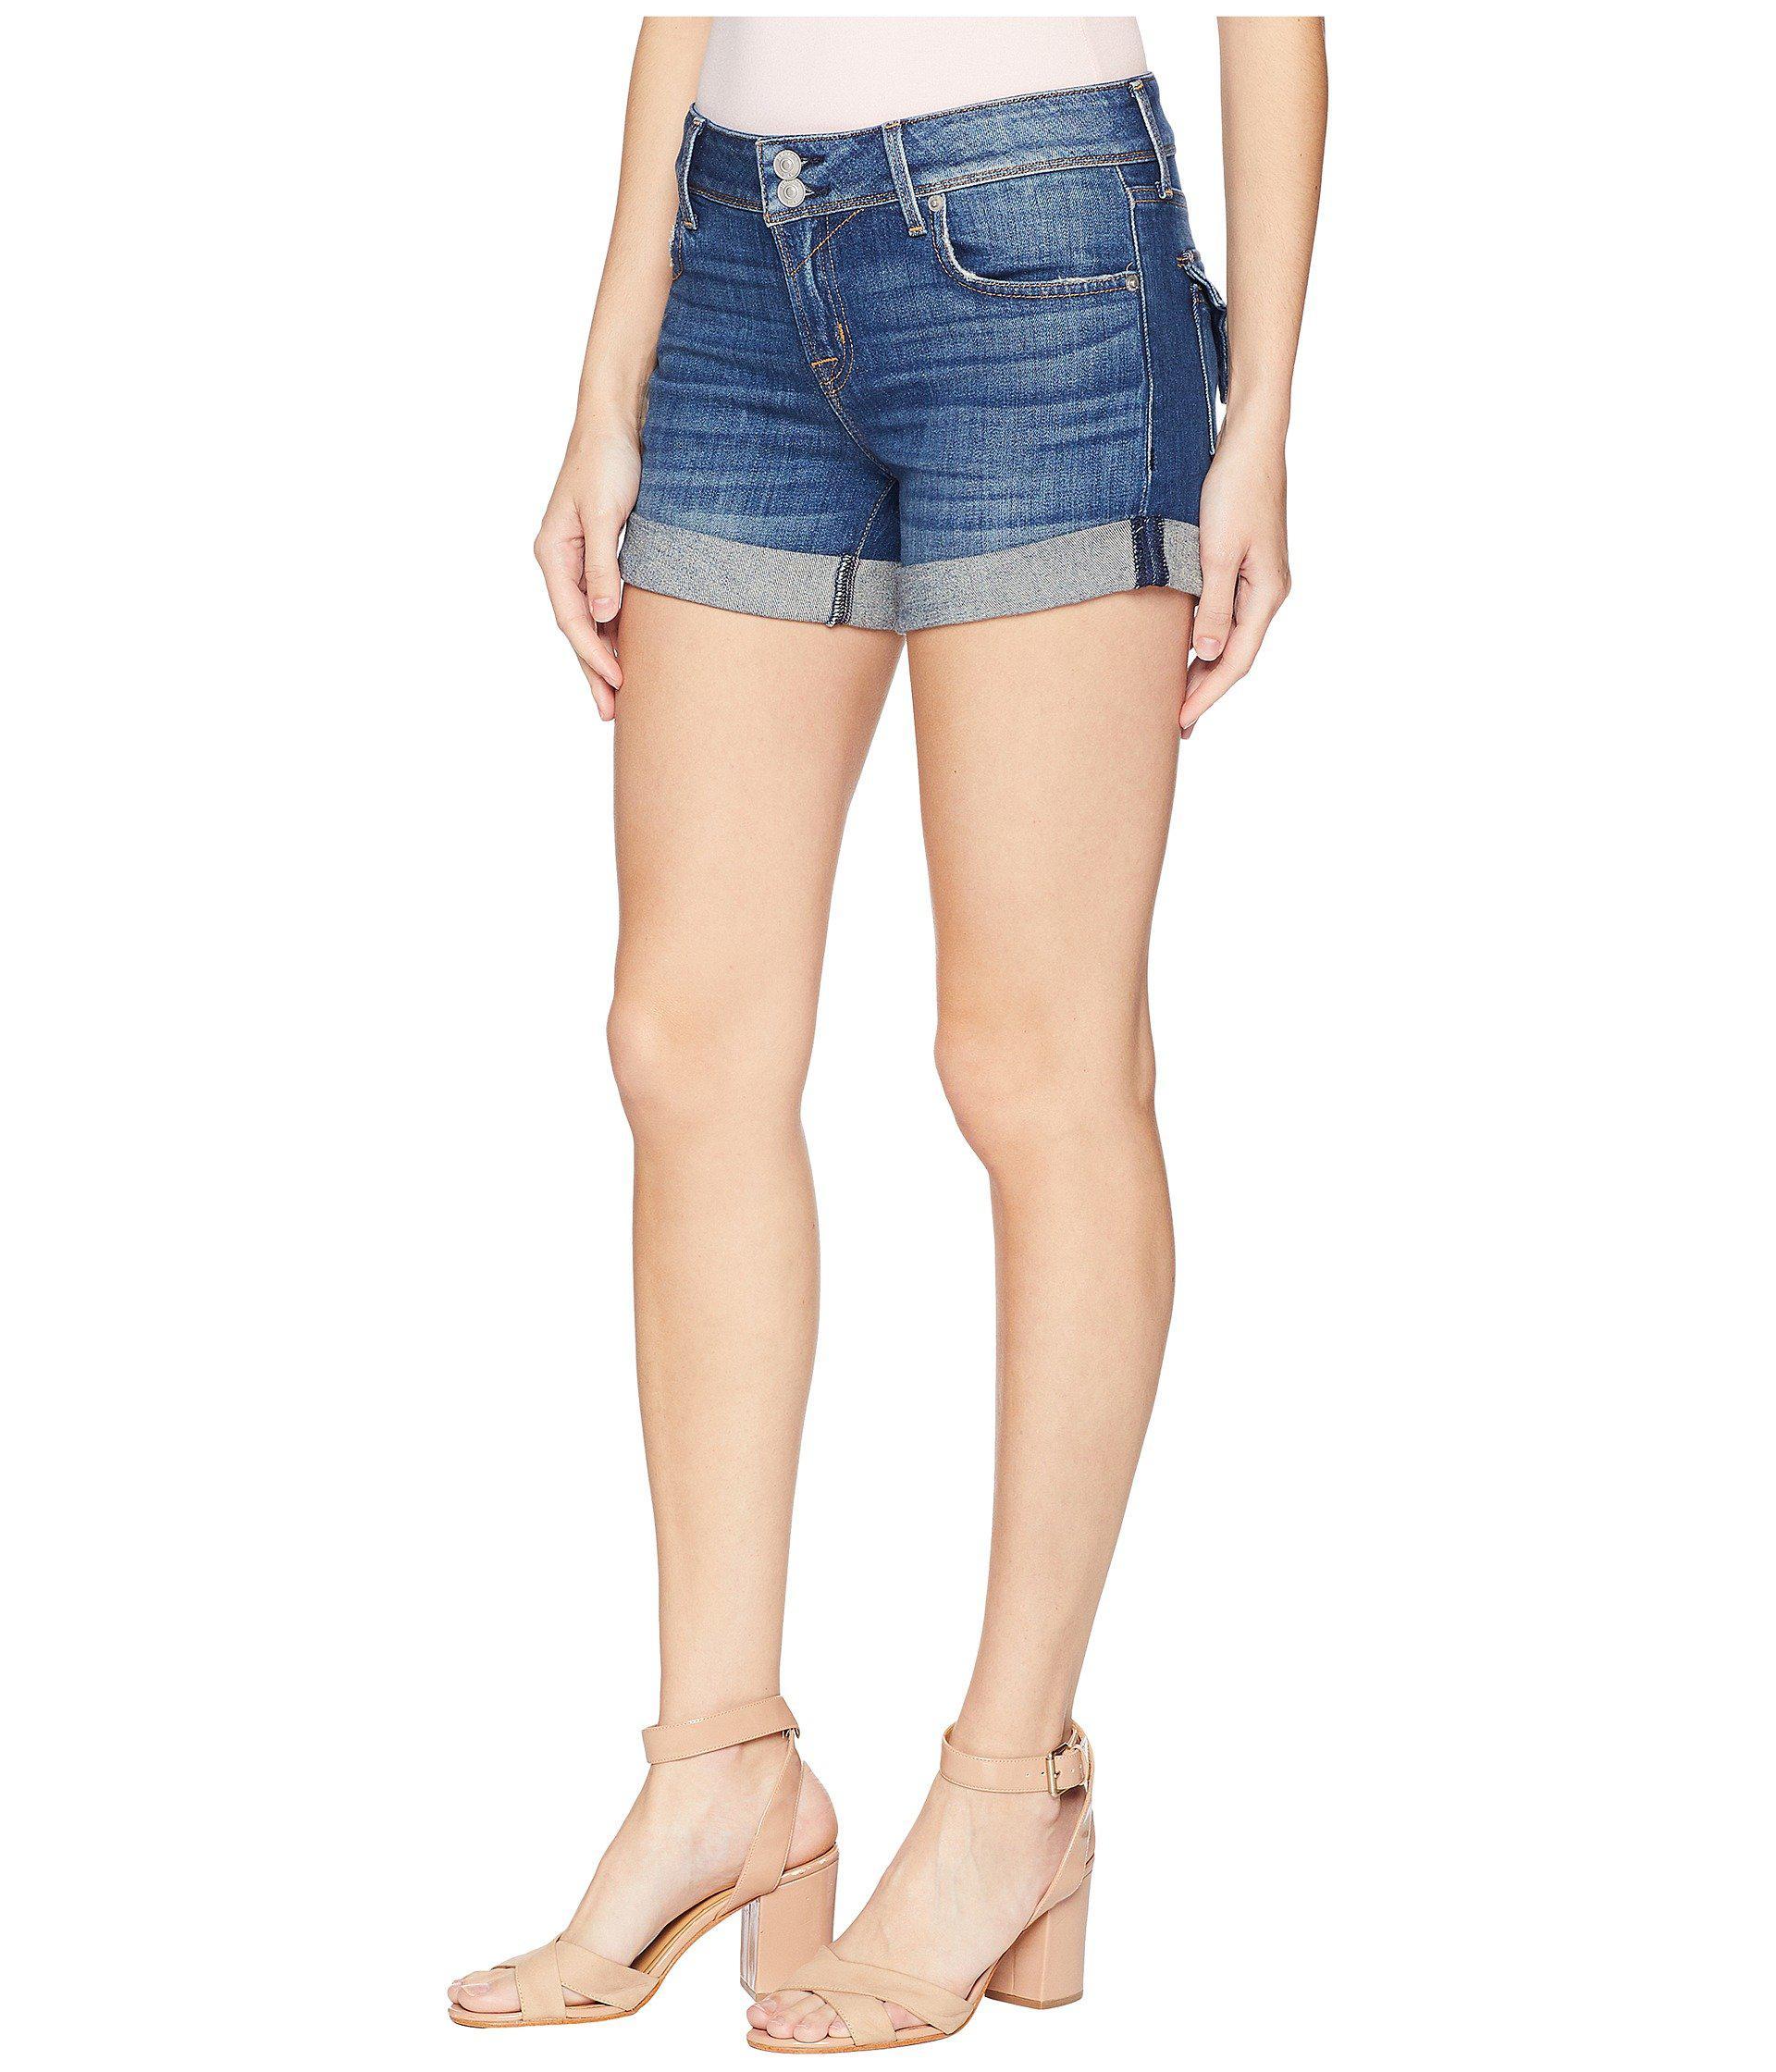 2401de56b9 Hudson Jeans Croxley Mid Thigh Shorts In Ramona (ramona) Women's Shorts in  Blue - Lyst